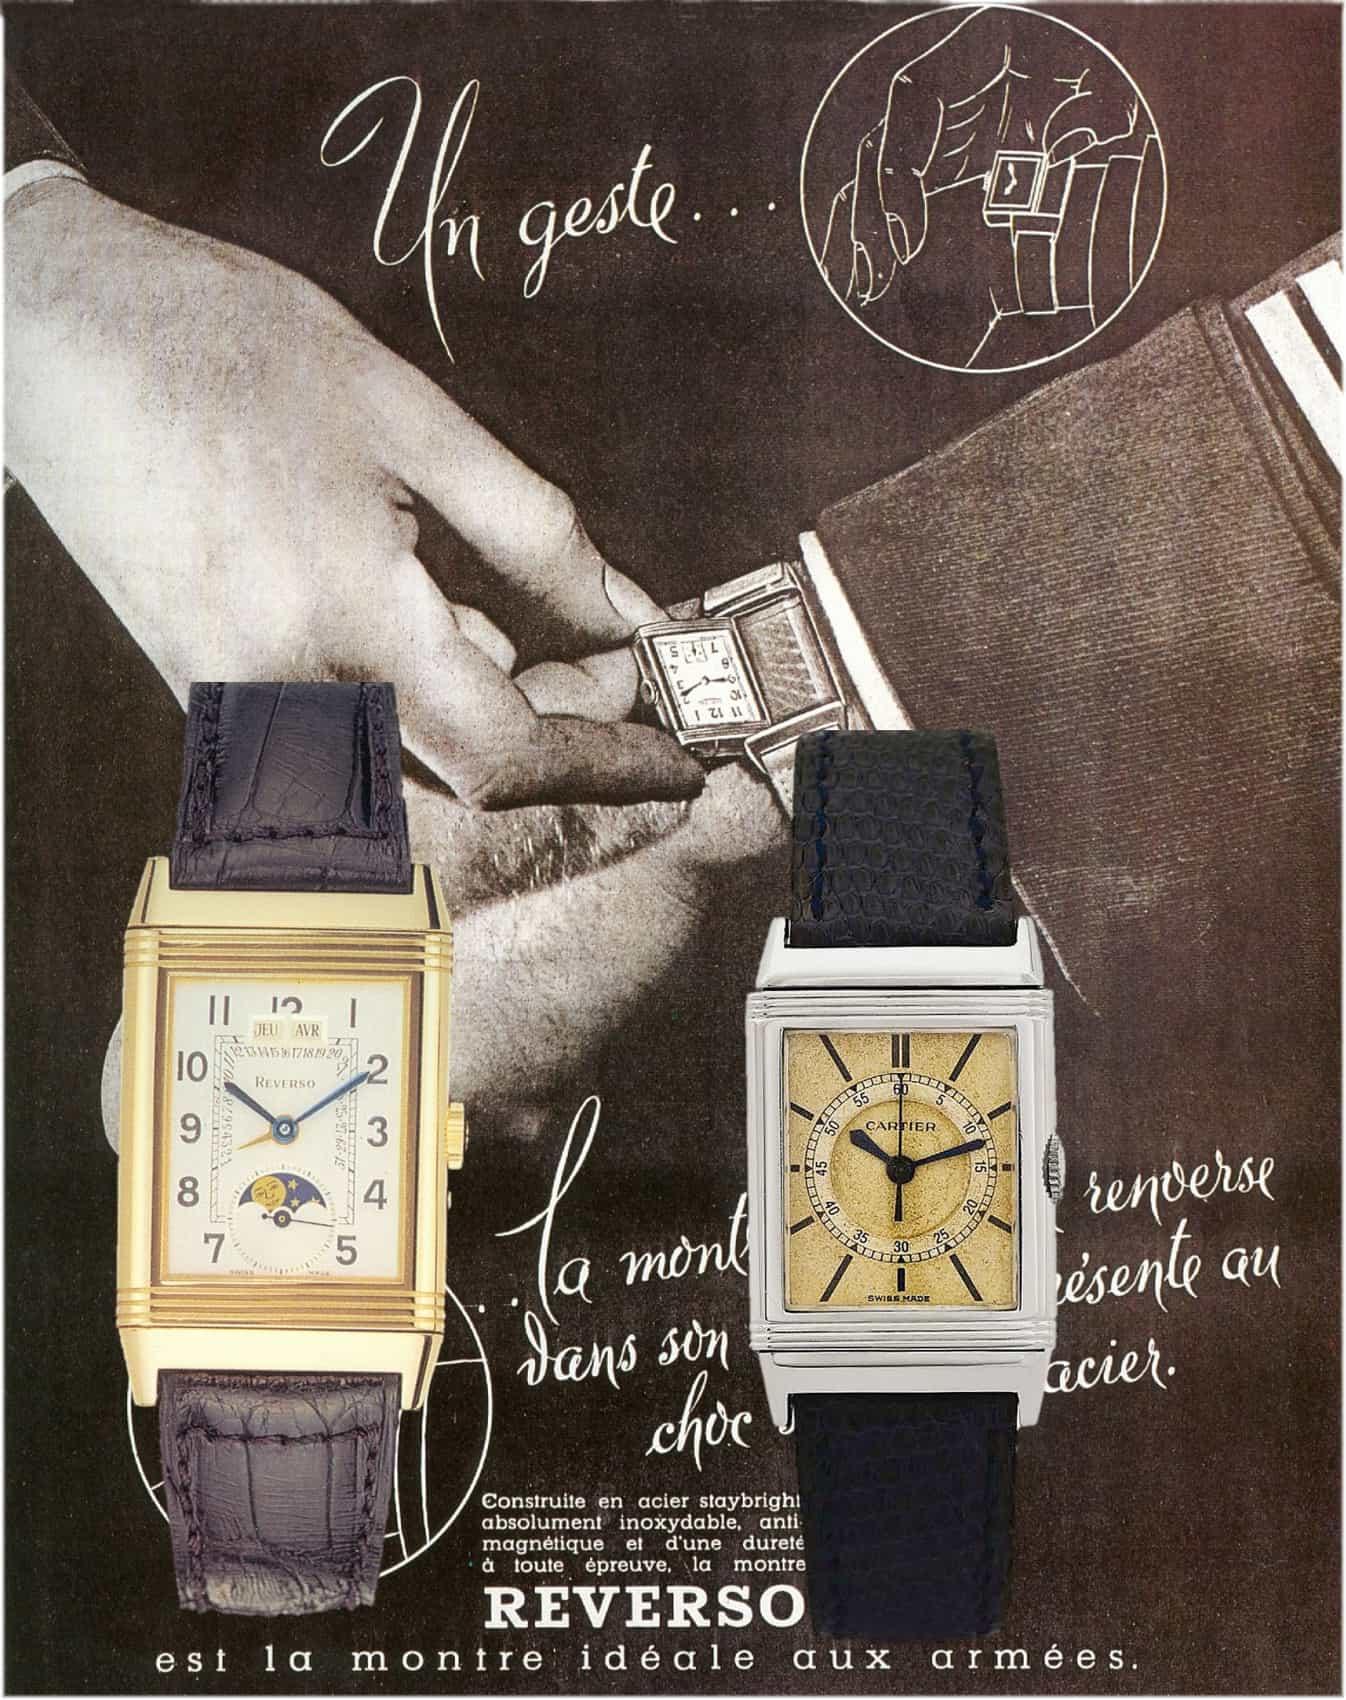 Jaeger LeCoultre Reverso calendrier retrograde und Cartier Reverso Zentralsekunde